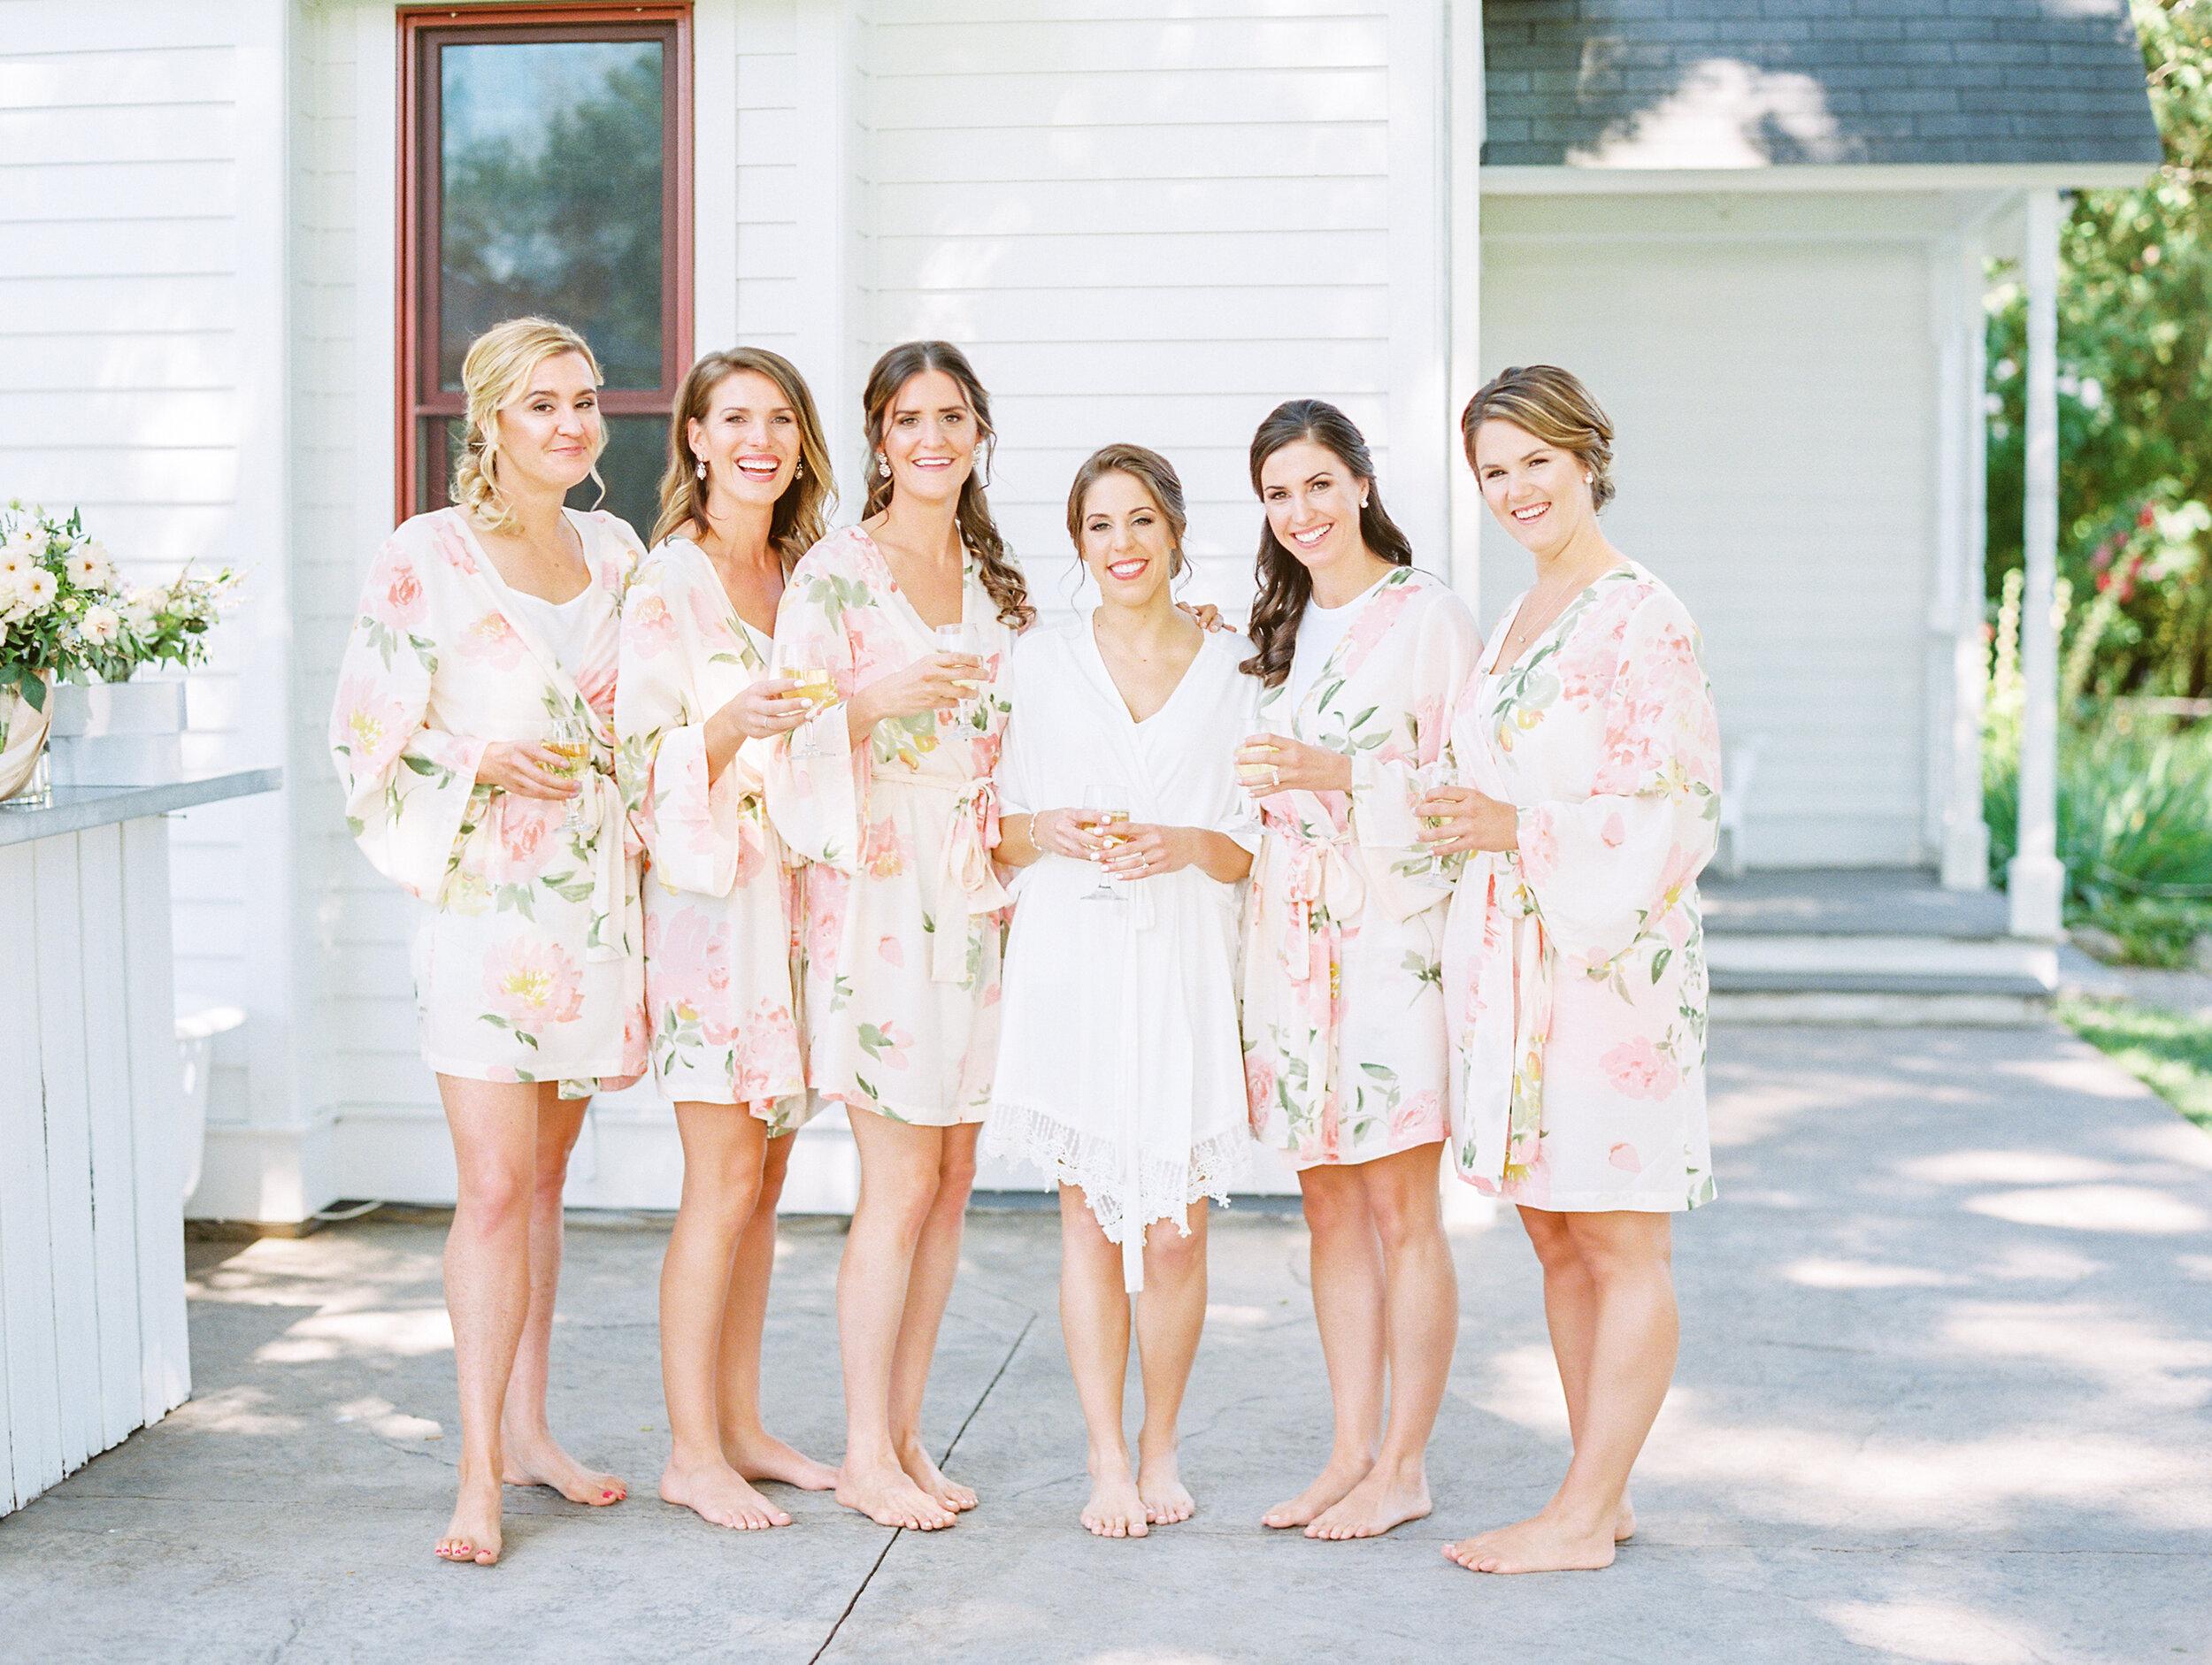 Steinlage+Wedding+Getting+Ready-50.jpg